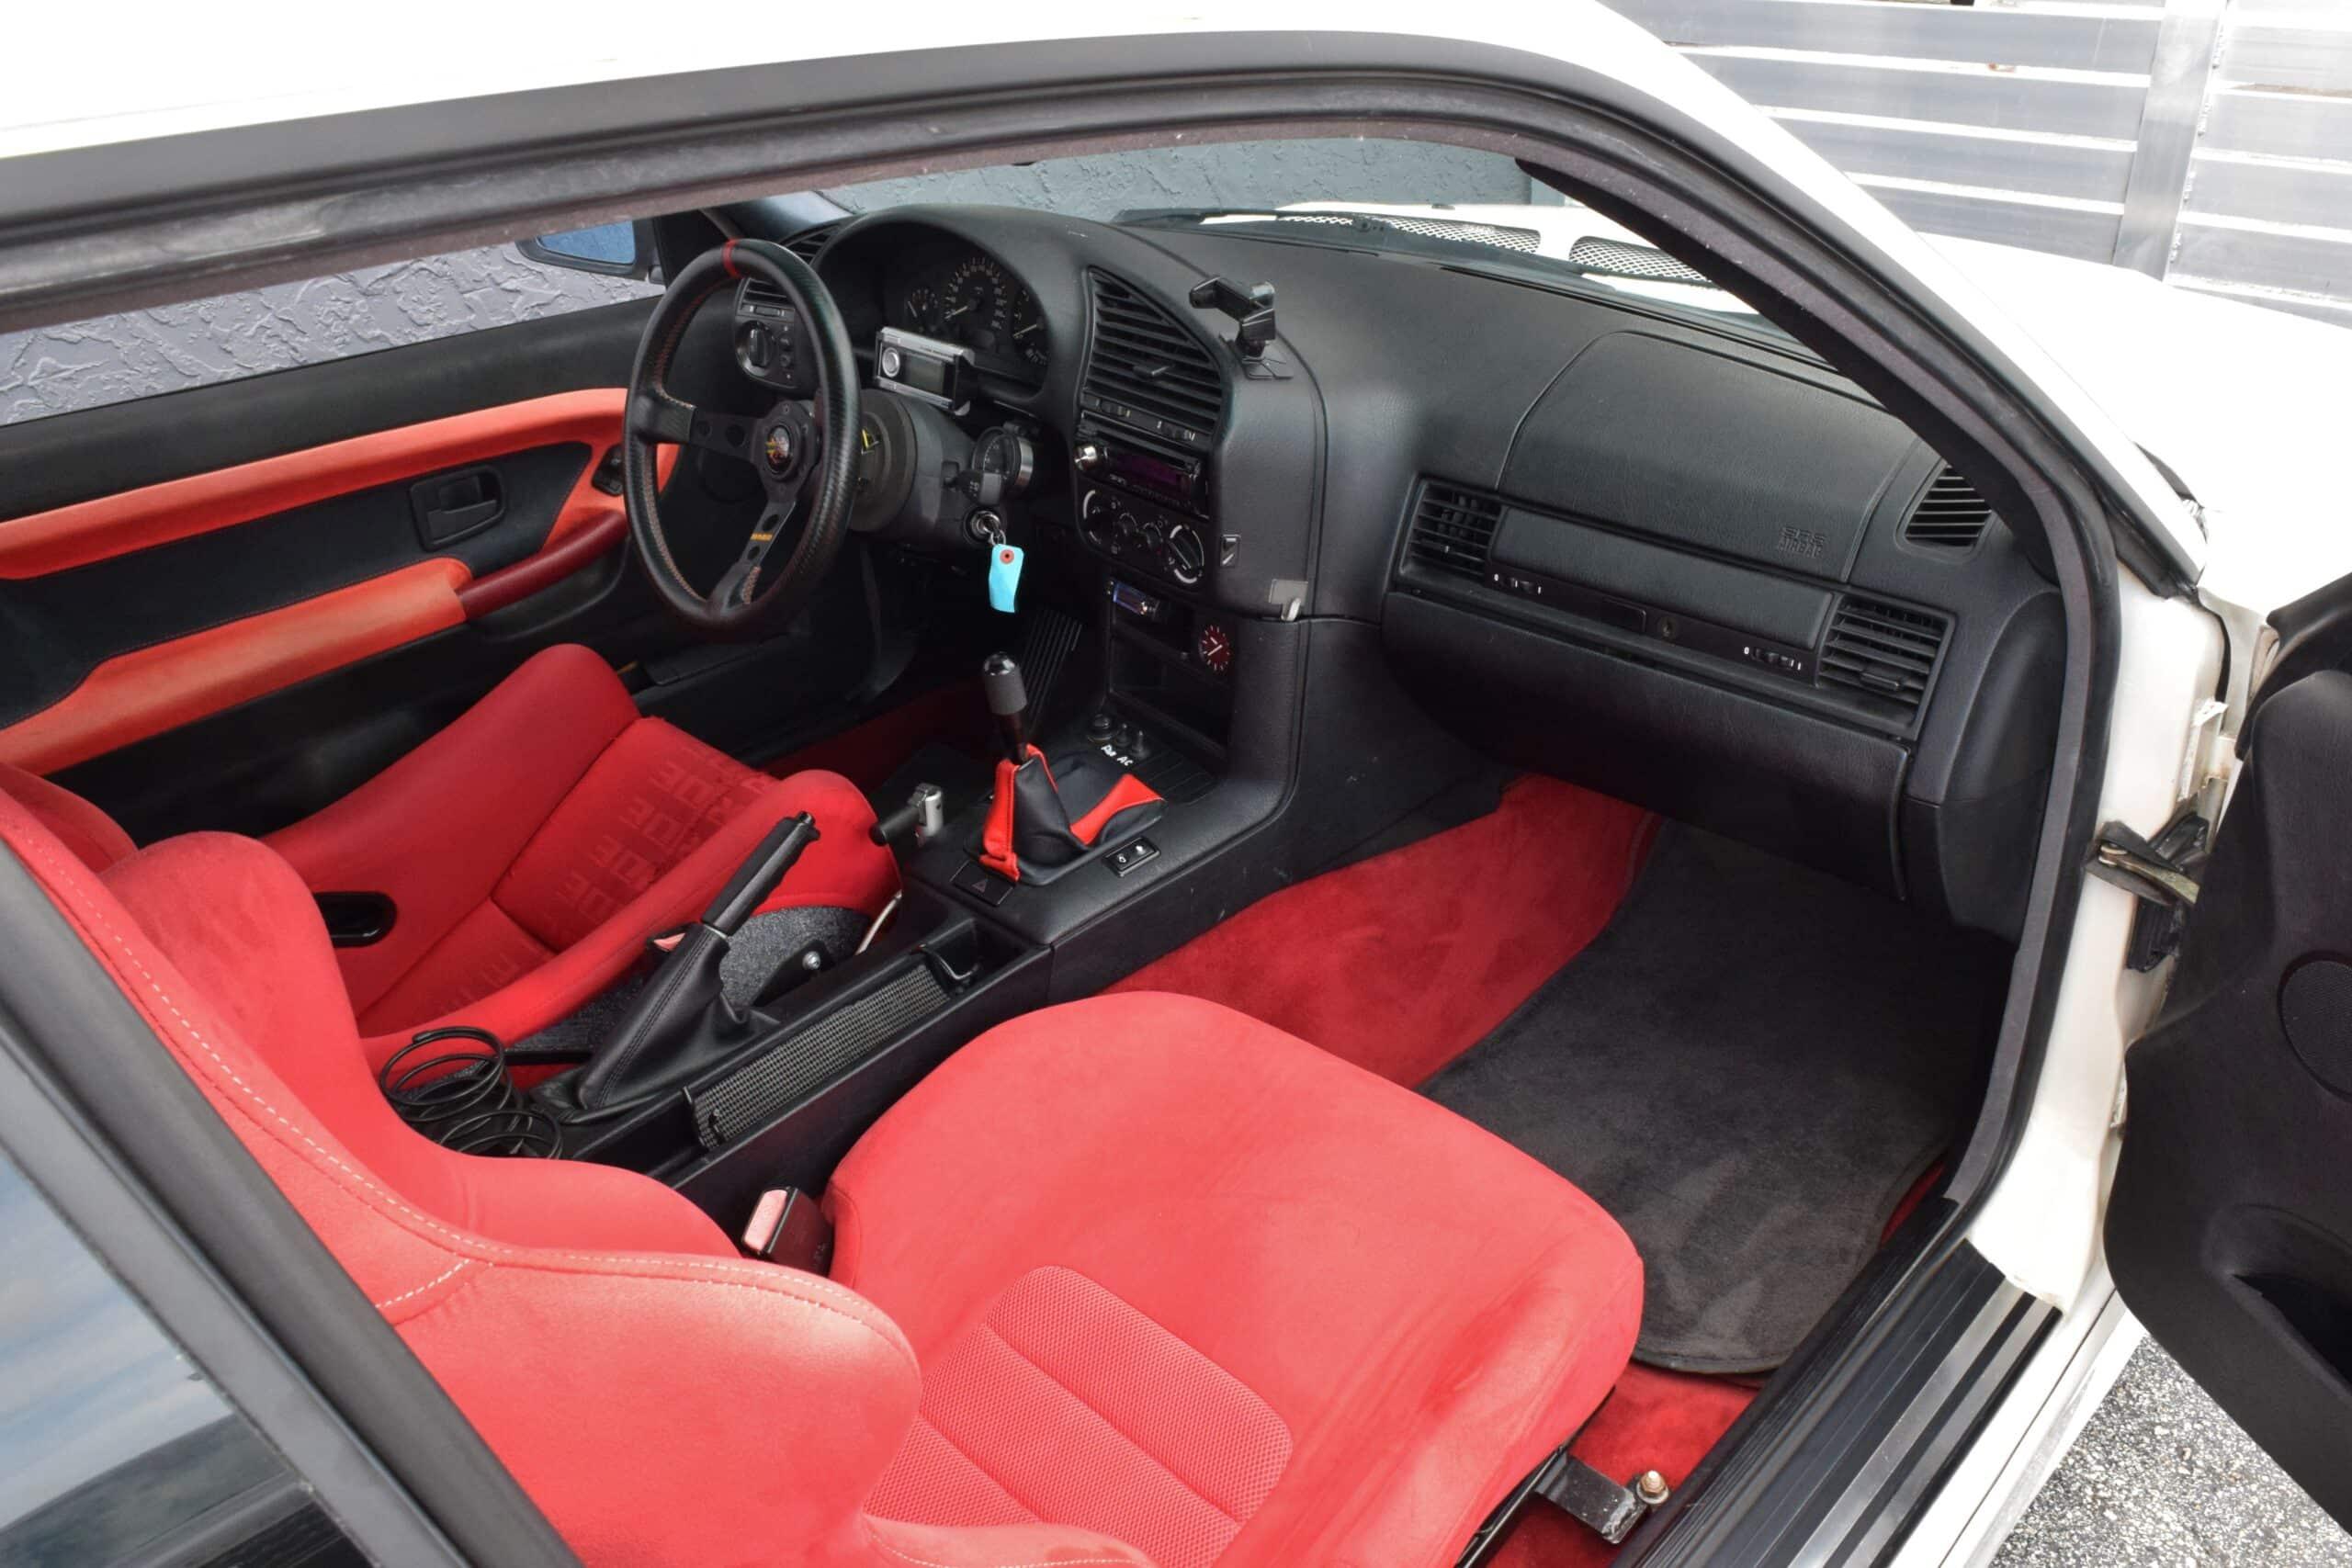 1995 BMW 3-Series E36 SR20DET TURBO 2.1L Bore HKS-6 Speed Manual-Big Brake Kit-Weds Sport Wheels-Bride Seats-Cold AC